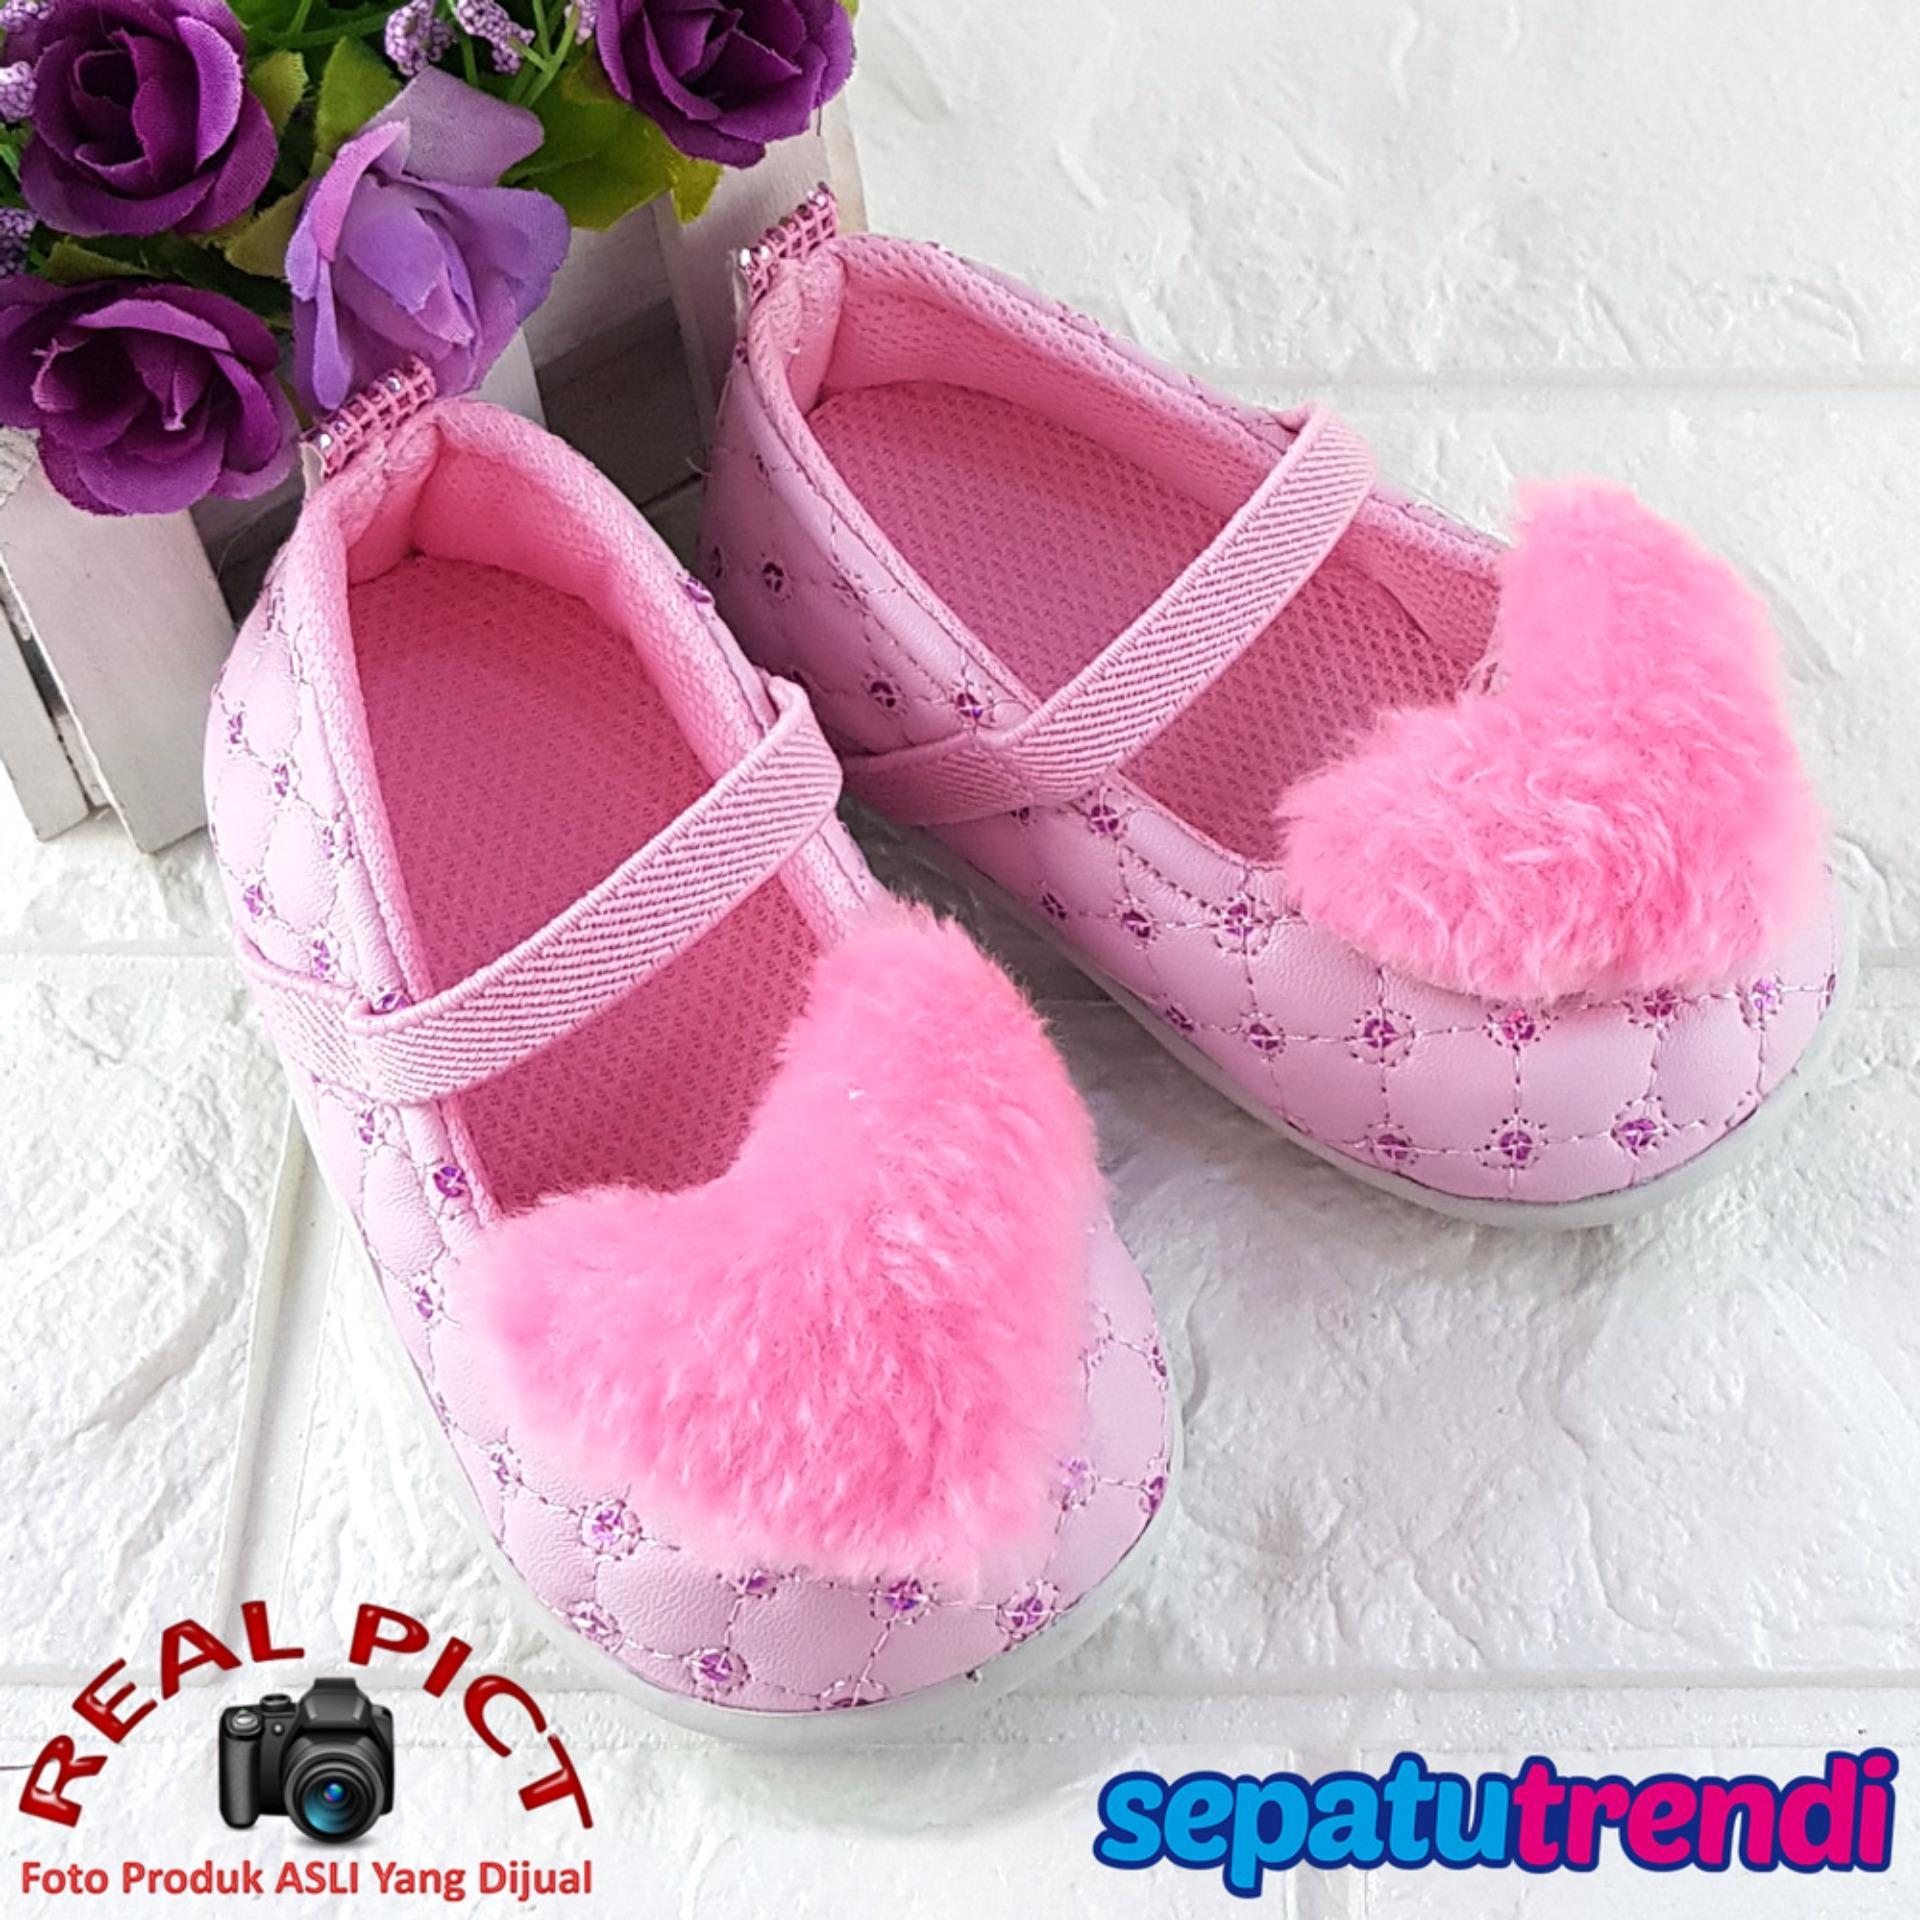 Model Trendi Sepatu Anak Bayi Perempuan Bllove Terbaru